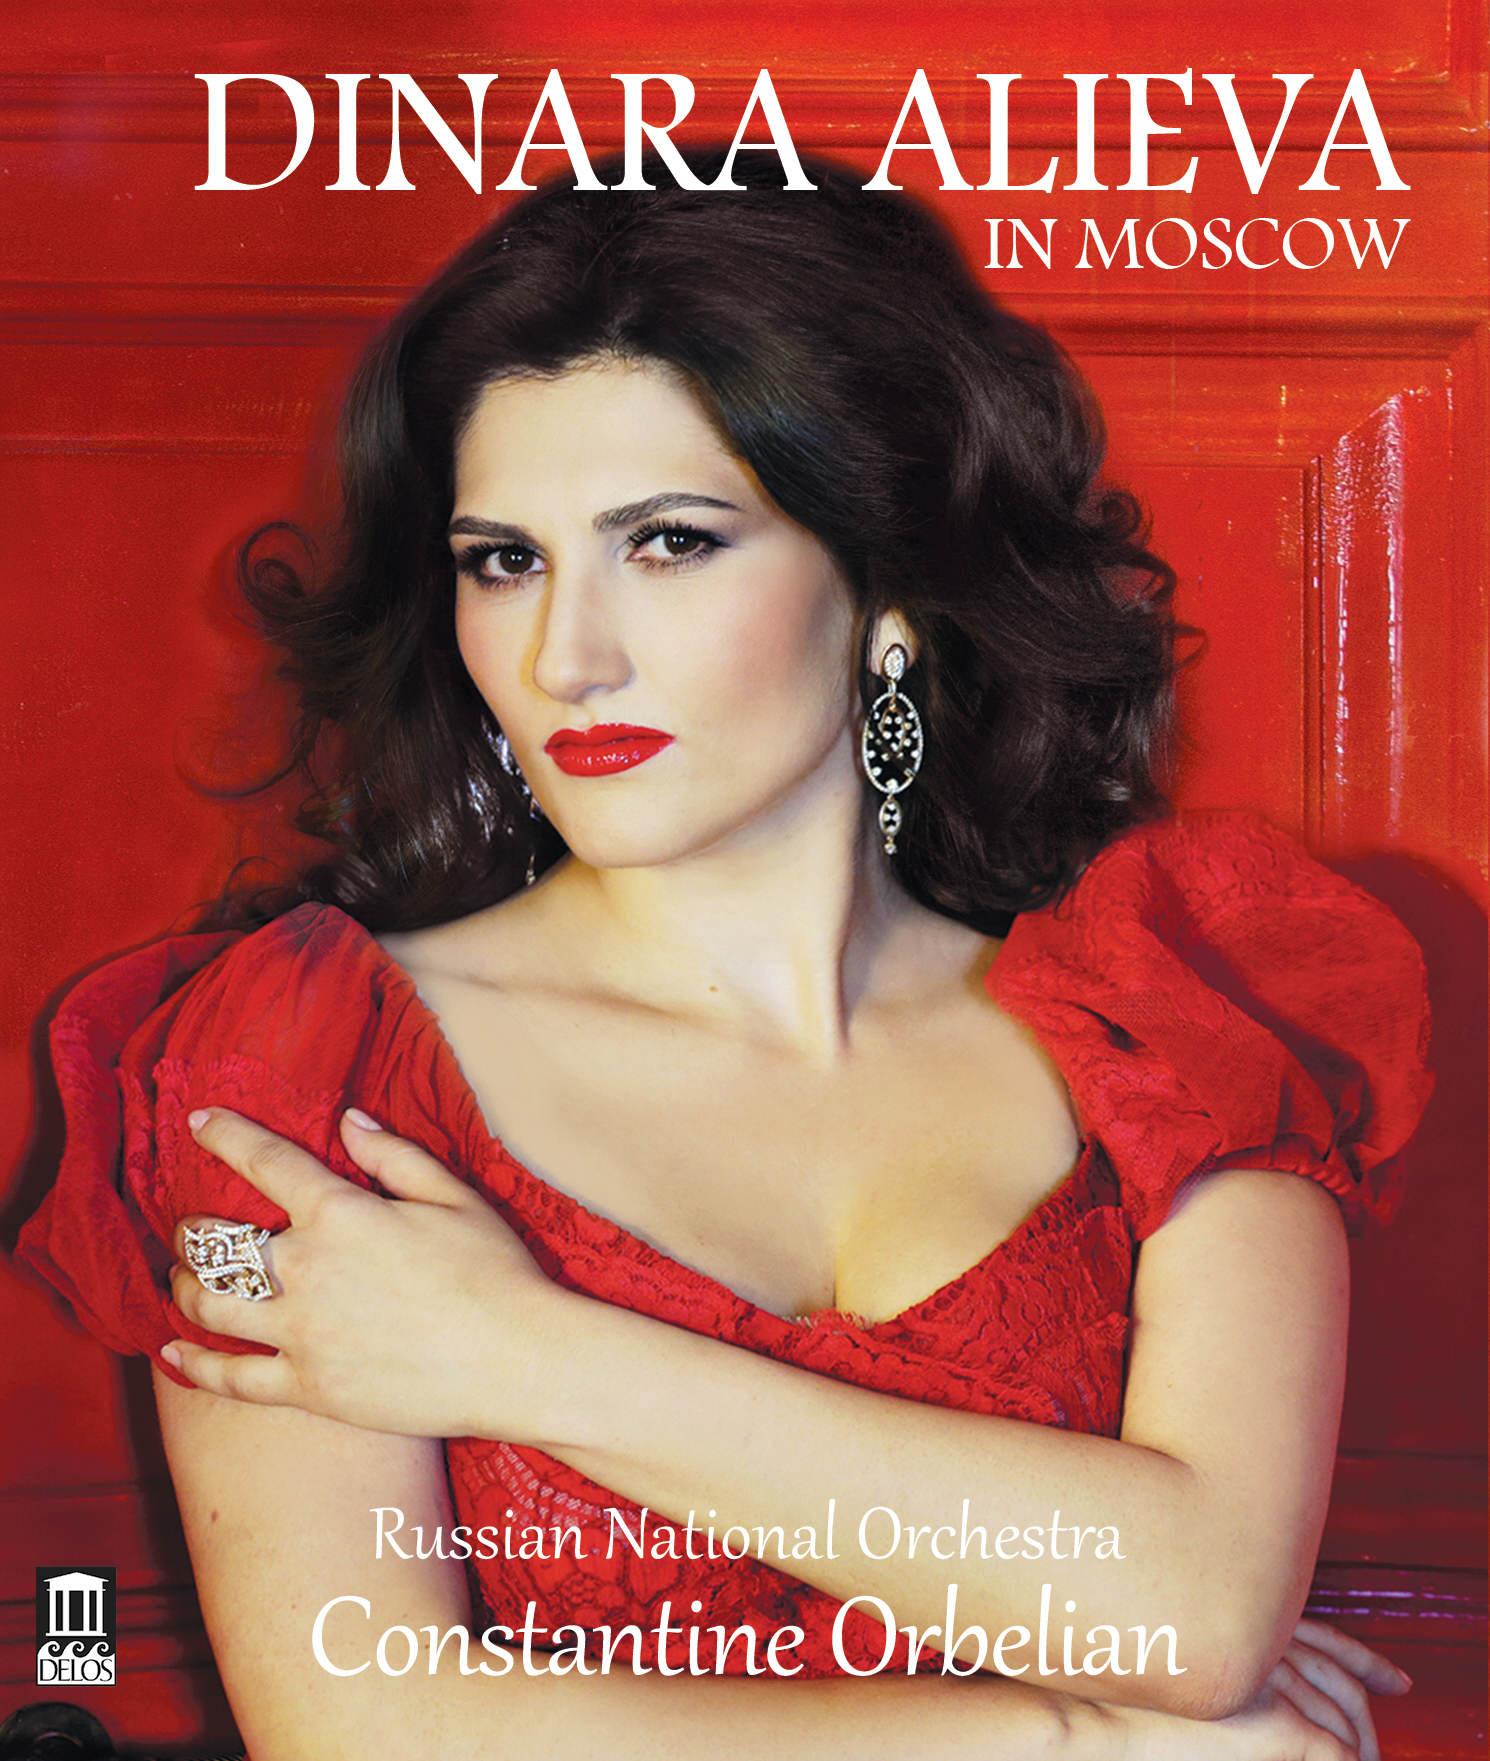 Dinara Alieva in Moscow